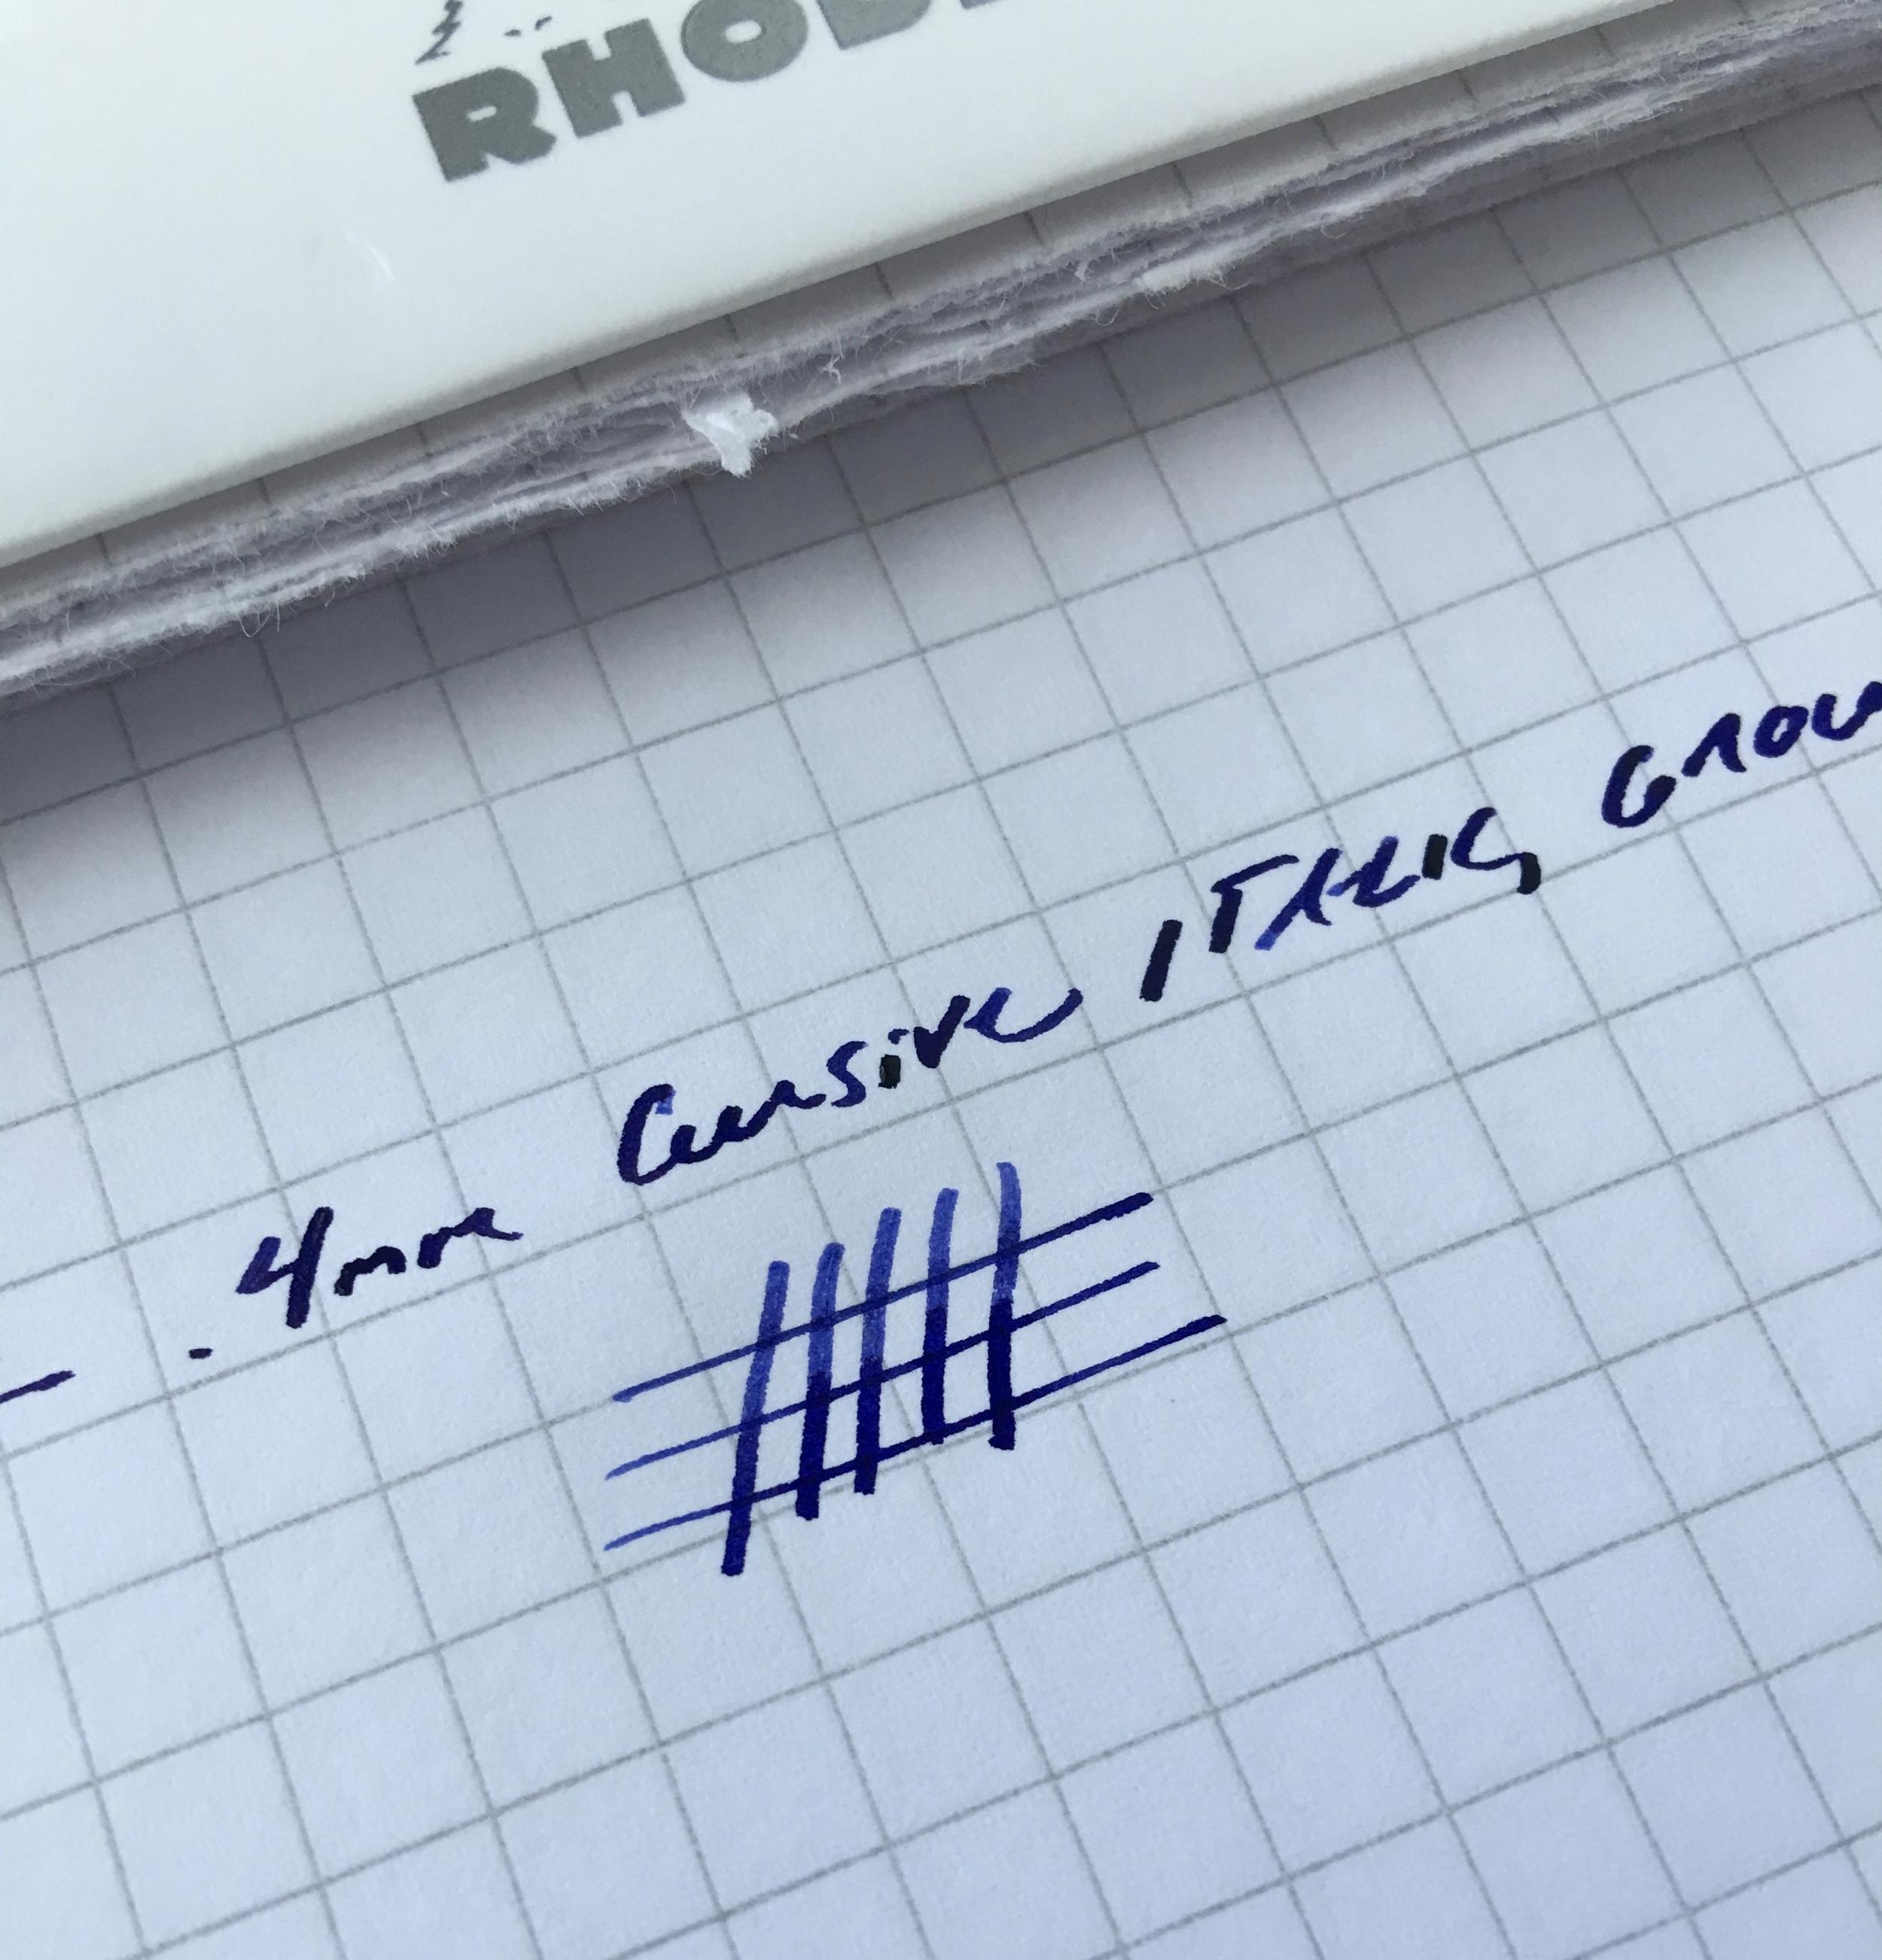 This .4mm cursive italic (formerly a medium nib) writes perfectly for me. Ink is Aurora blue.